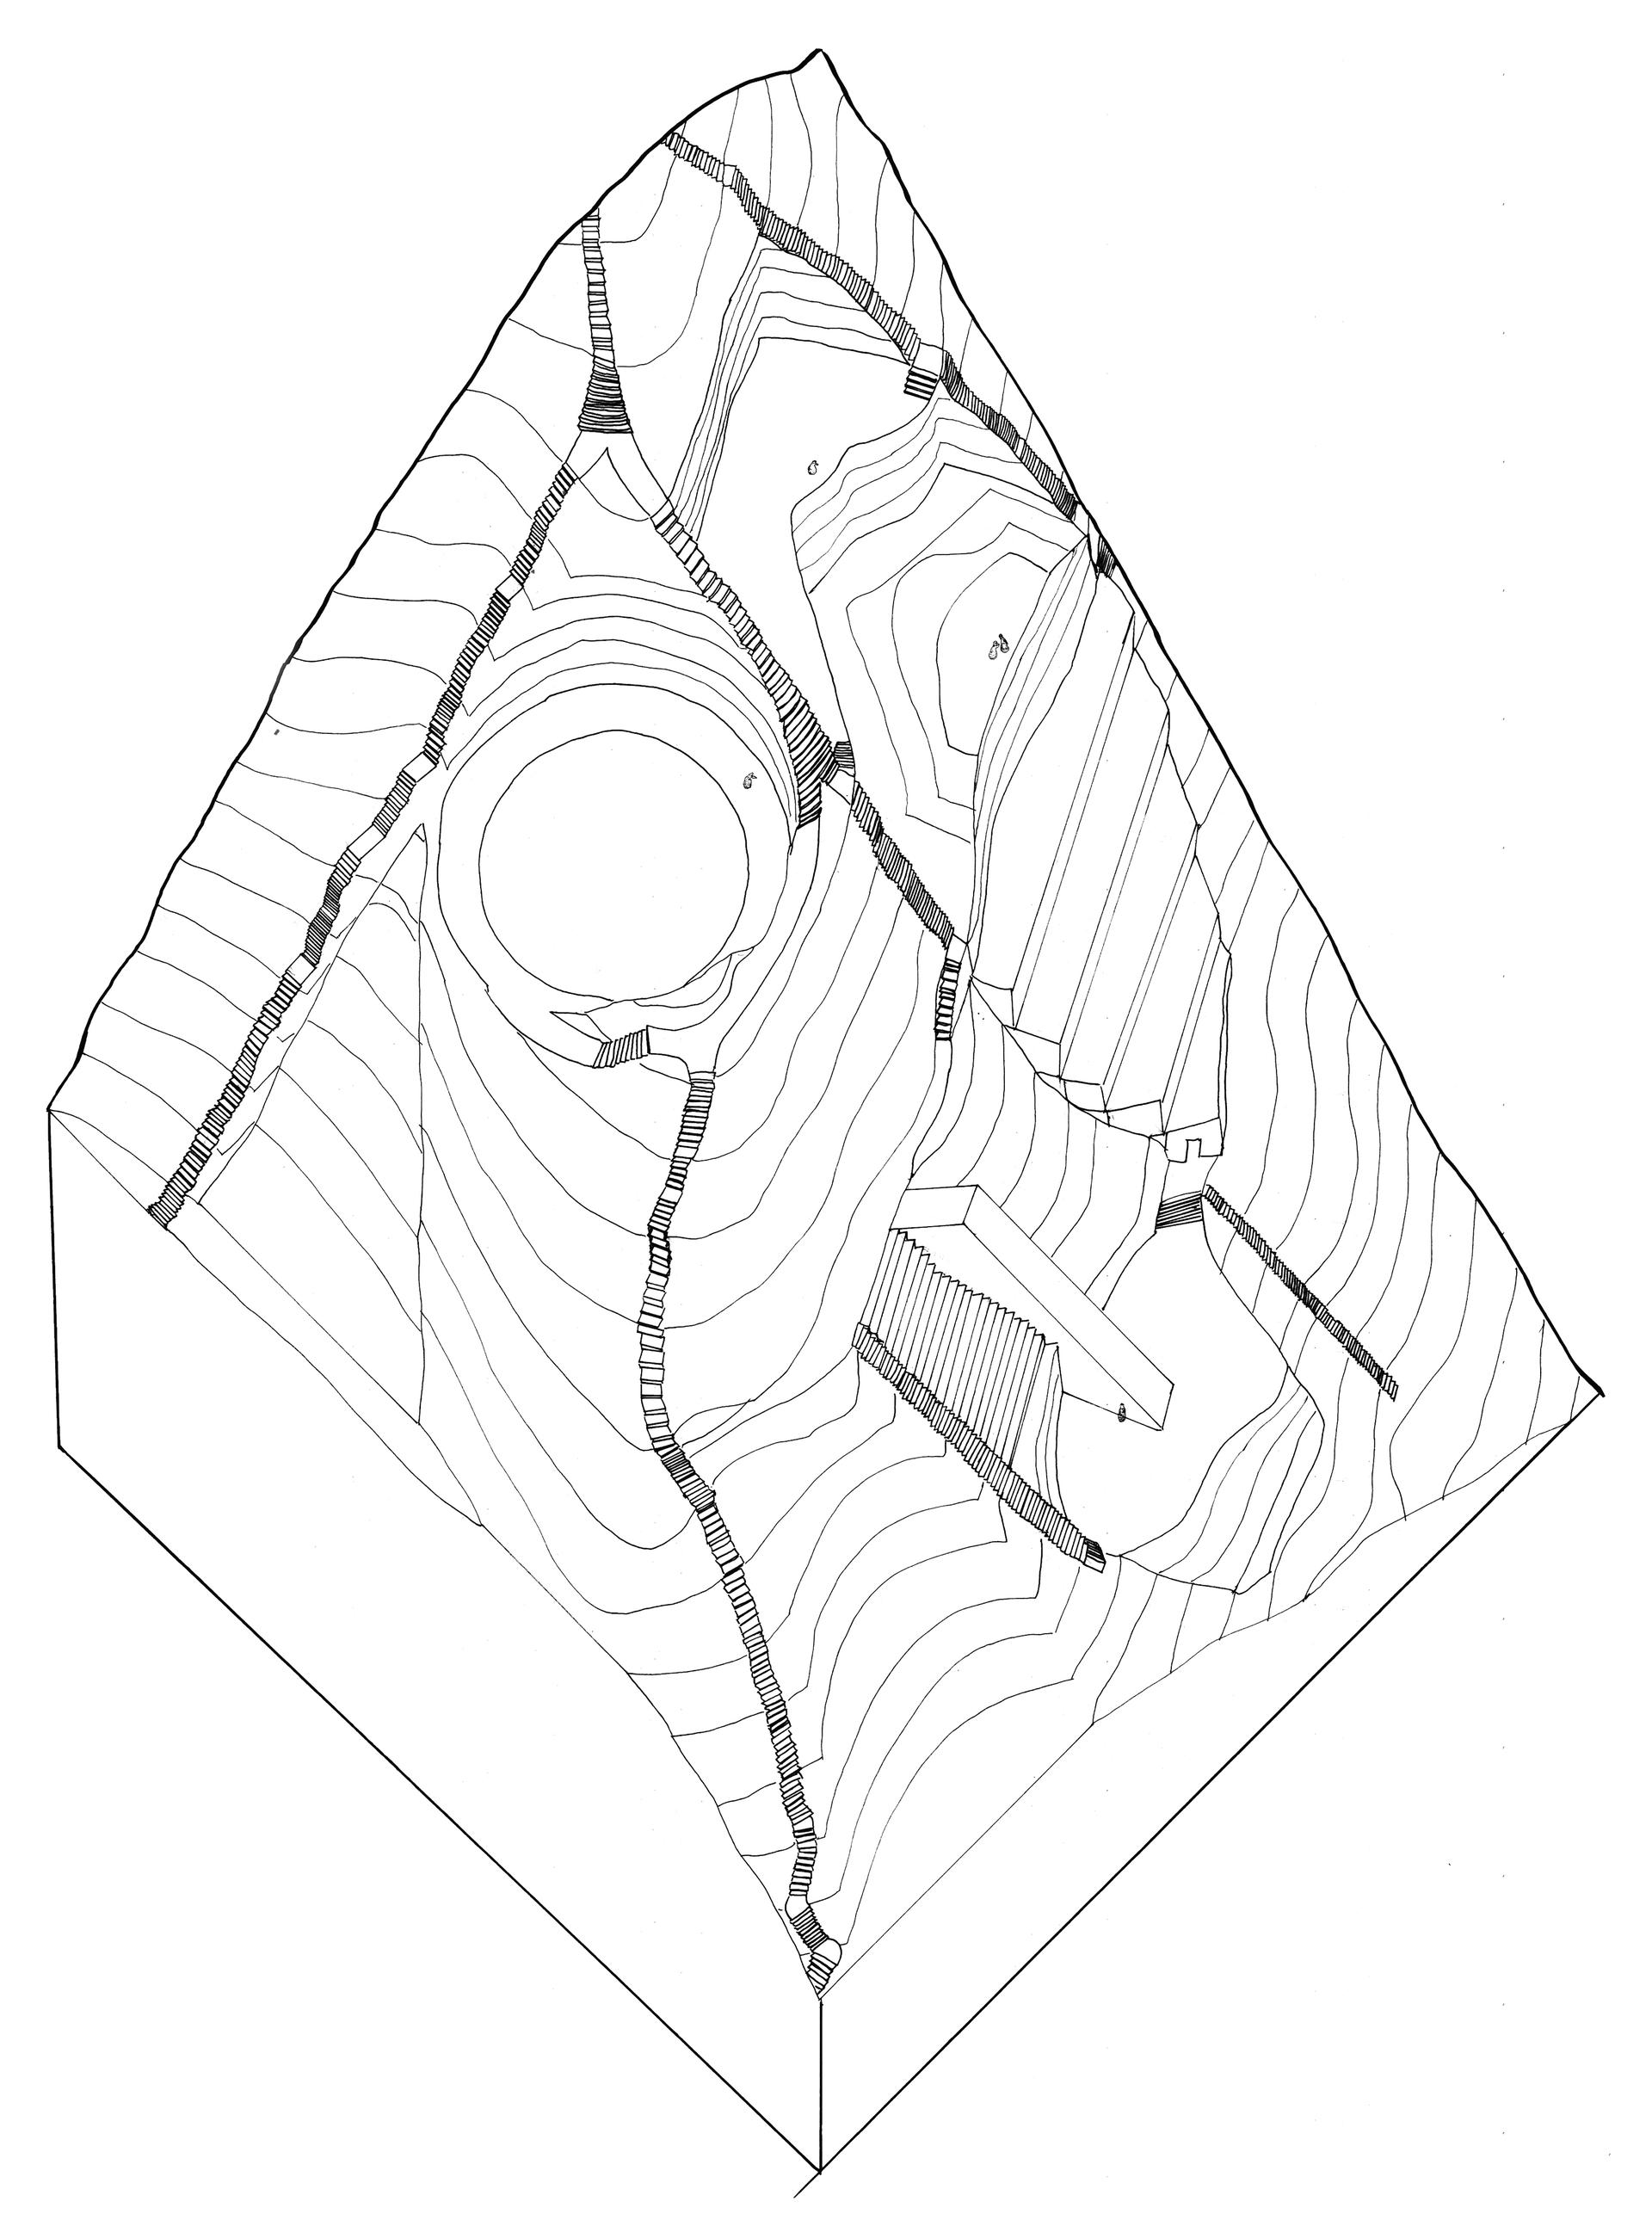 Enlarge Photo: Axonometric drawing (P5). By TSE Pui Hei Anson.